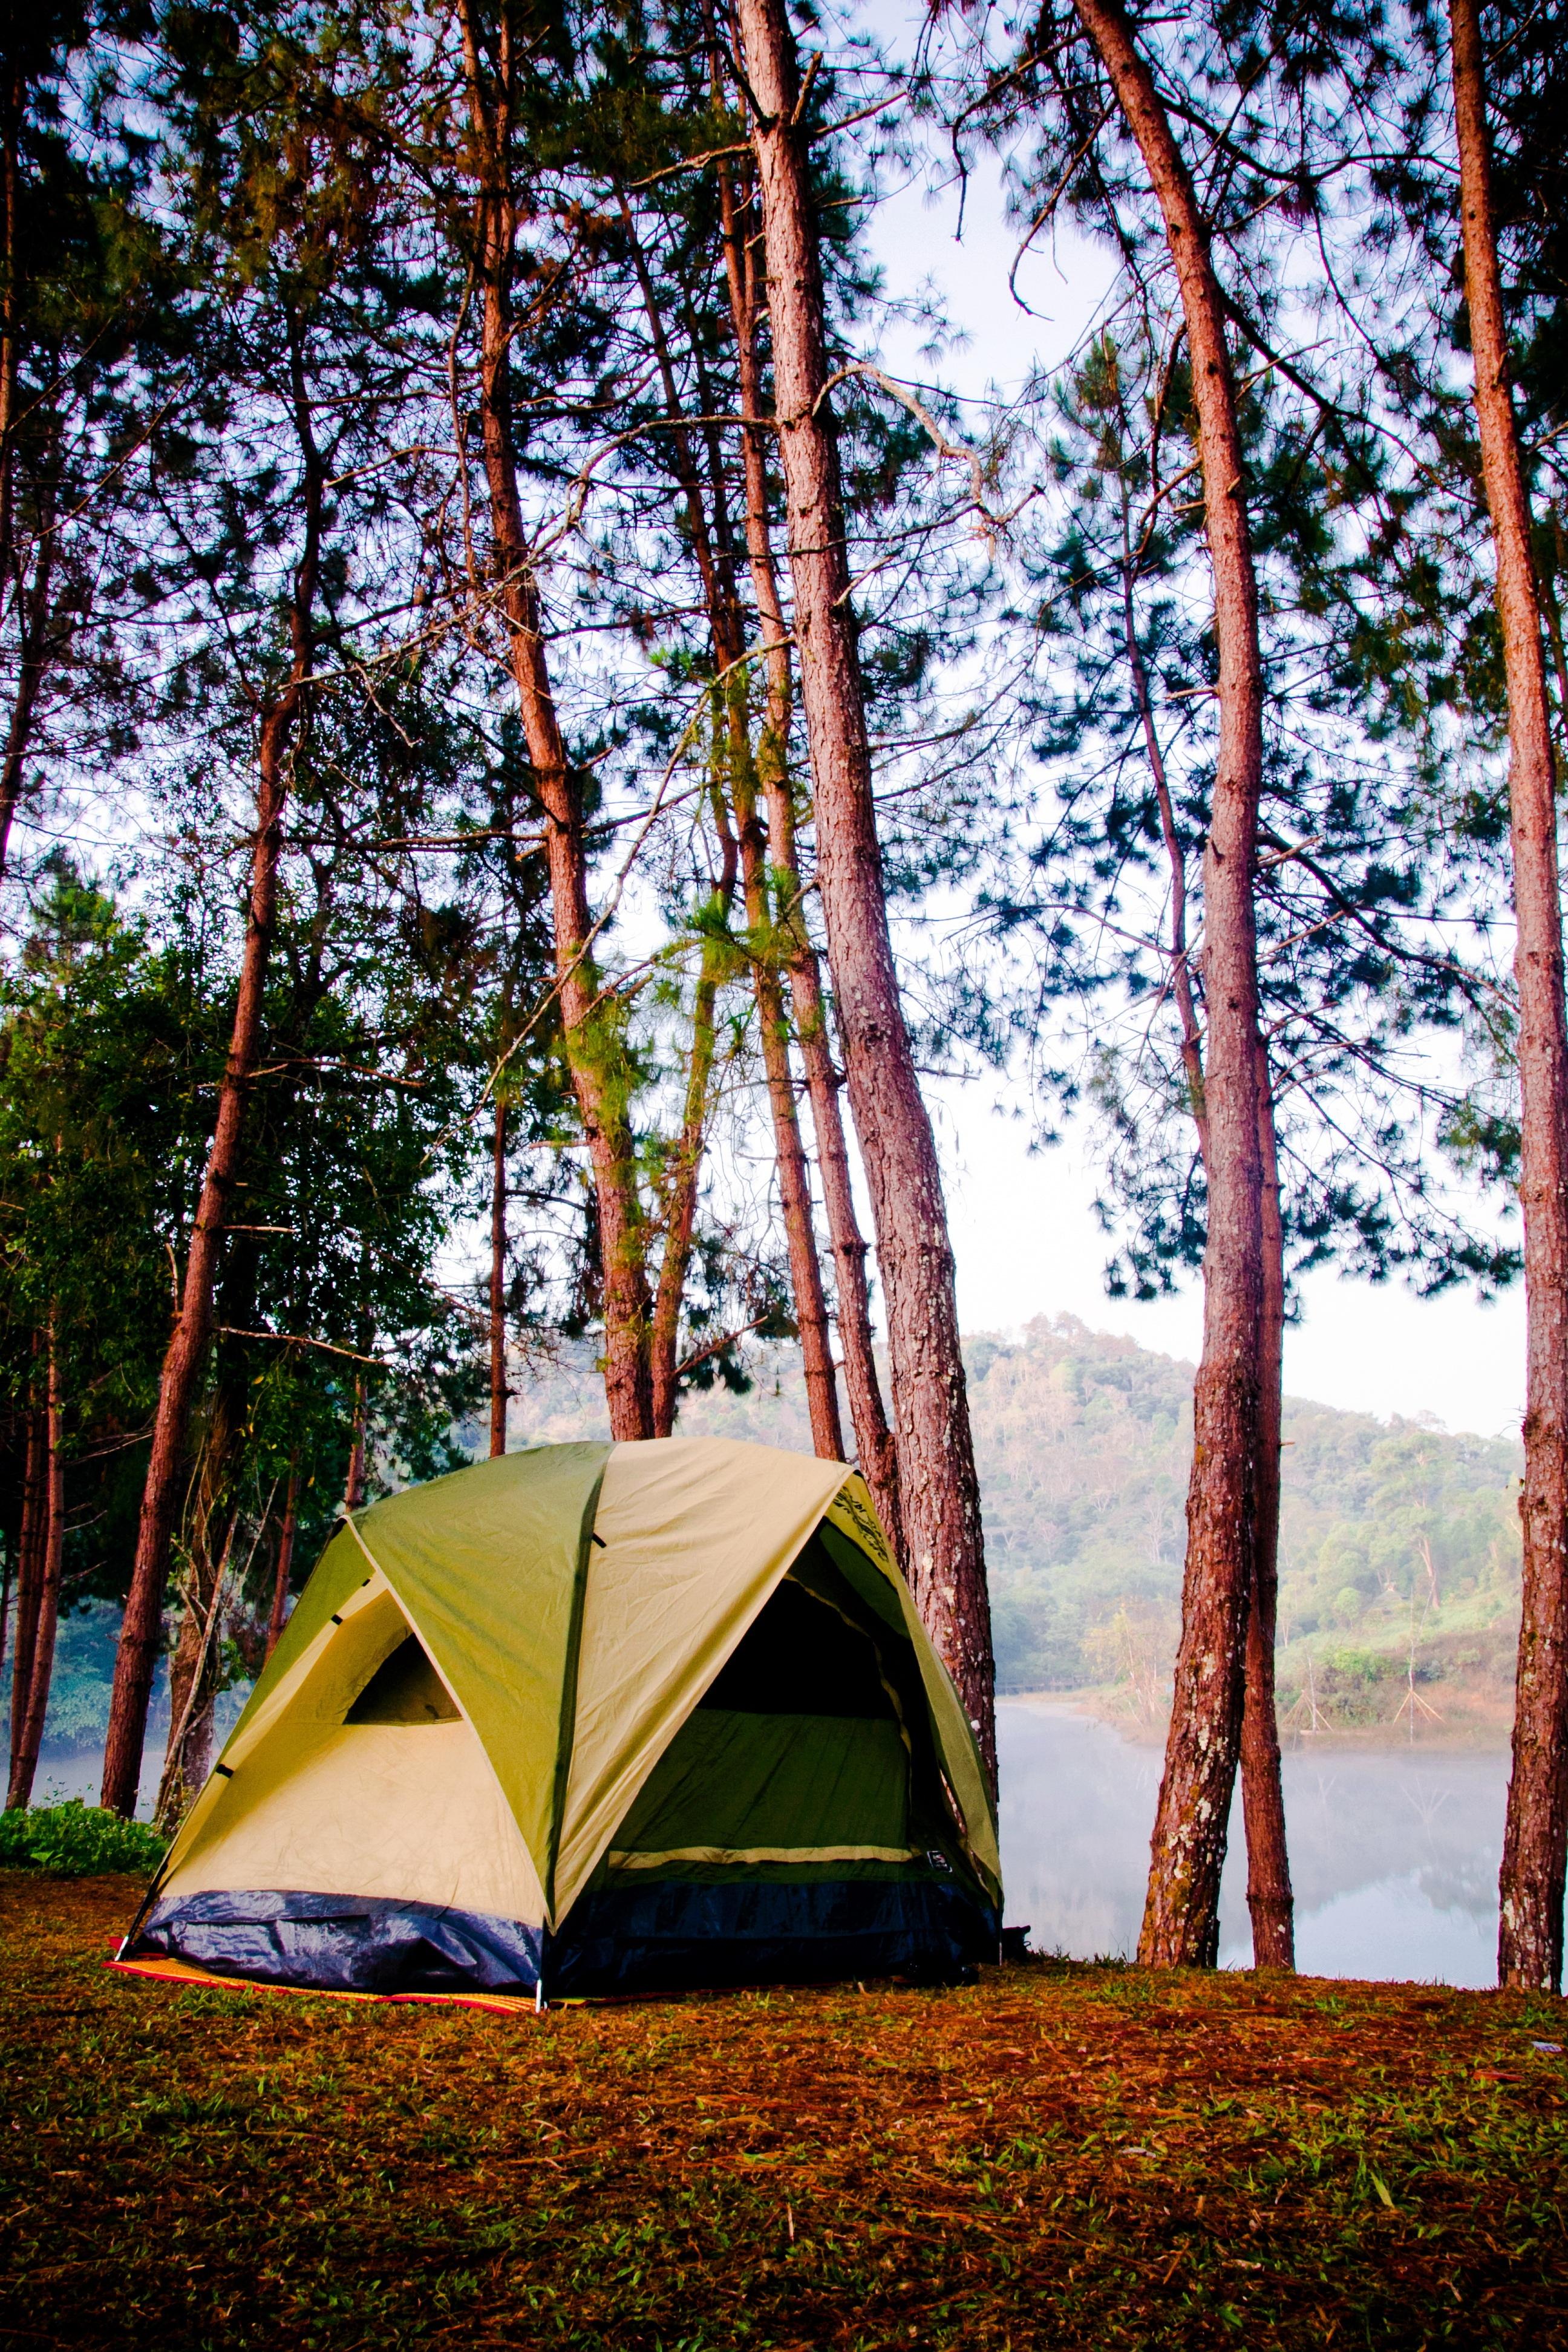 Палатка в лесу картинка